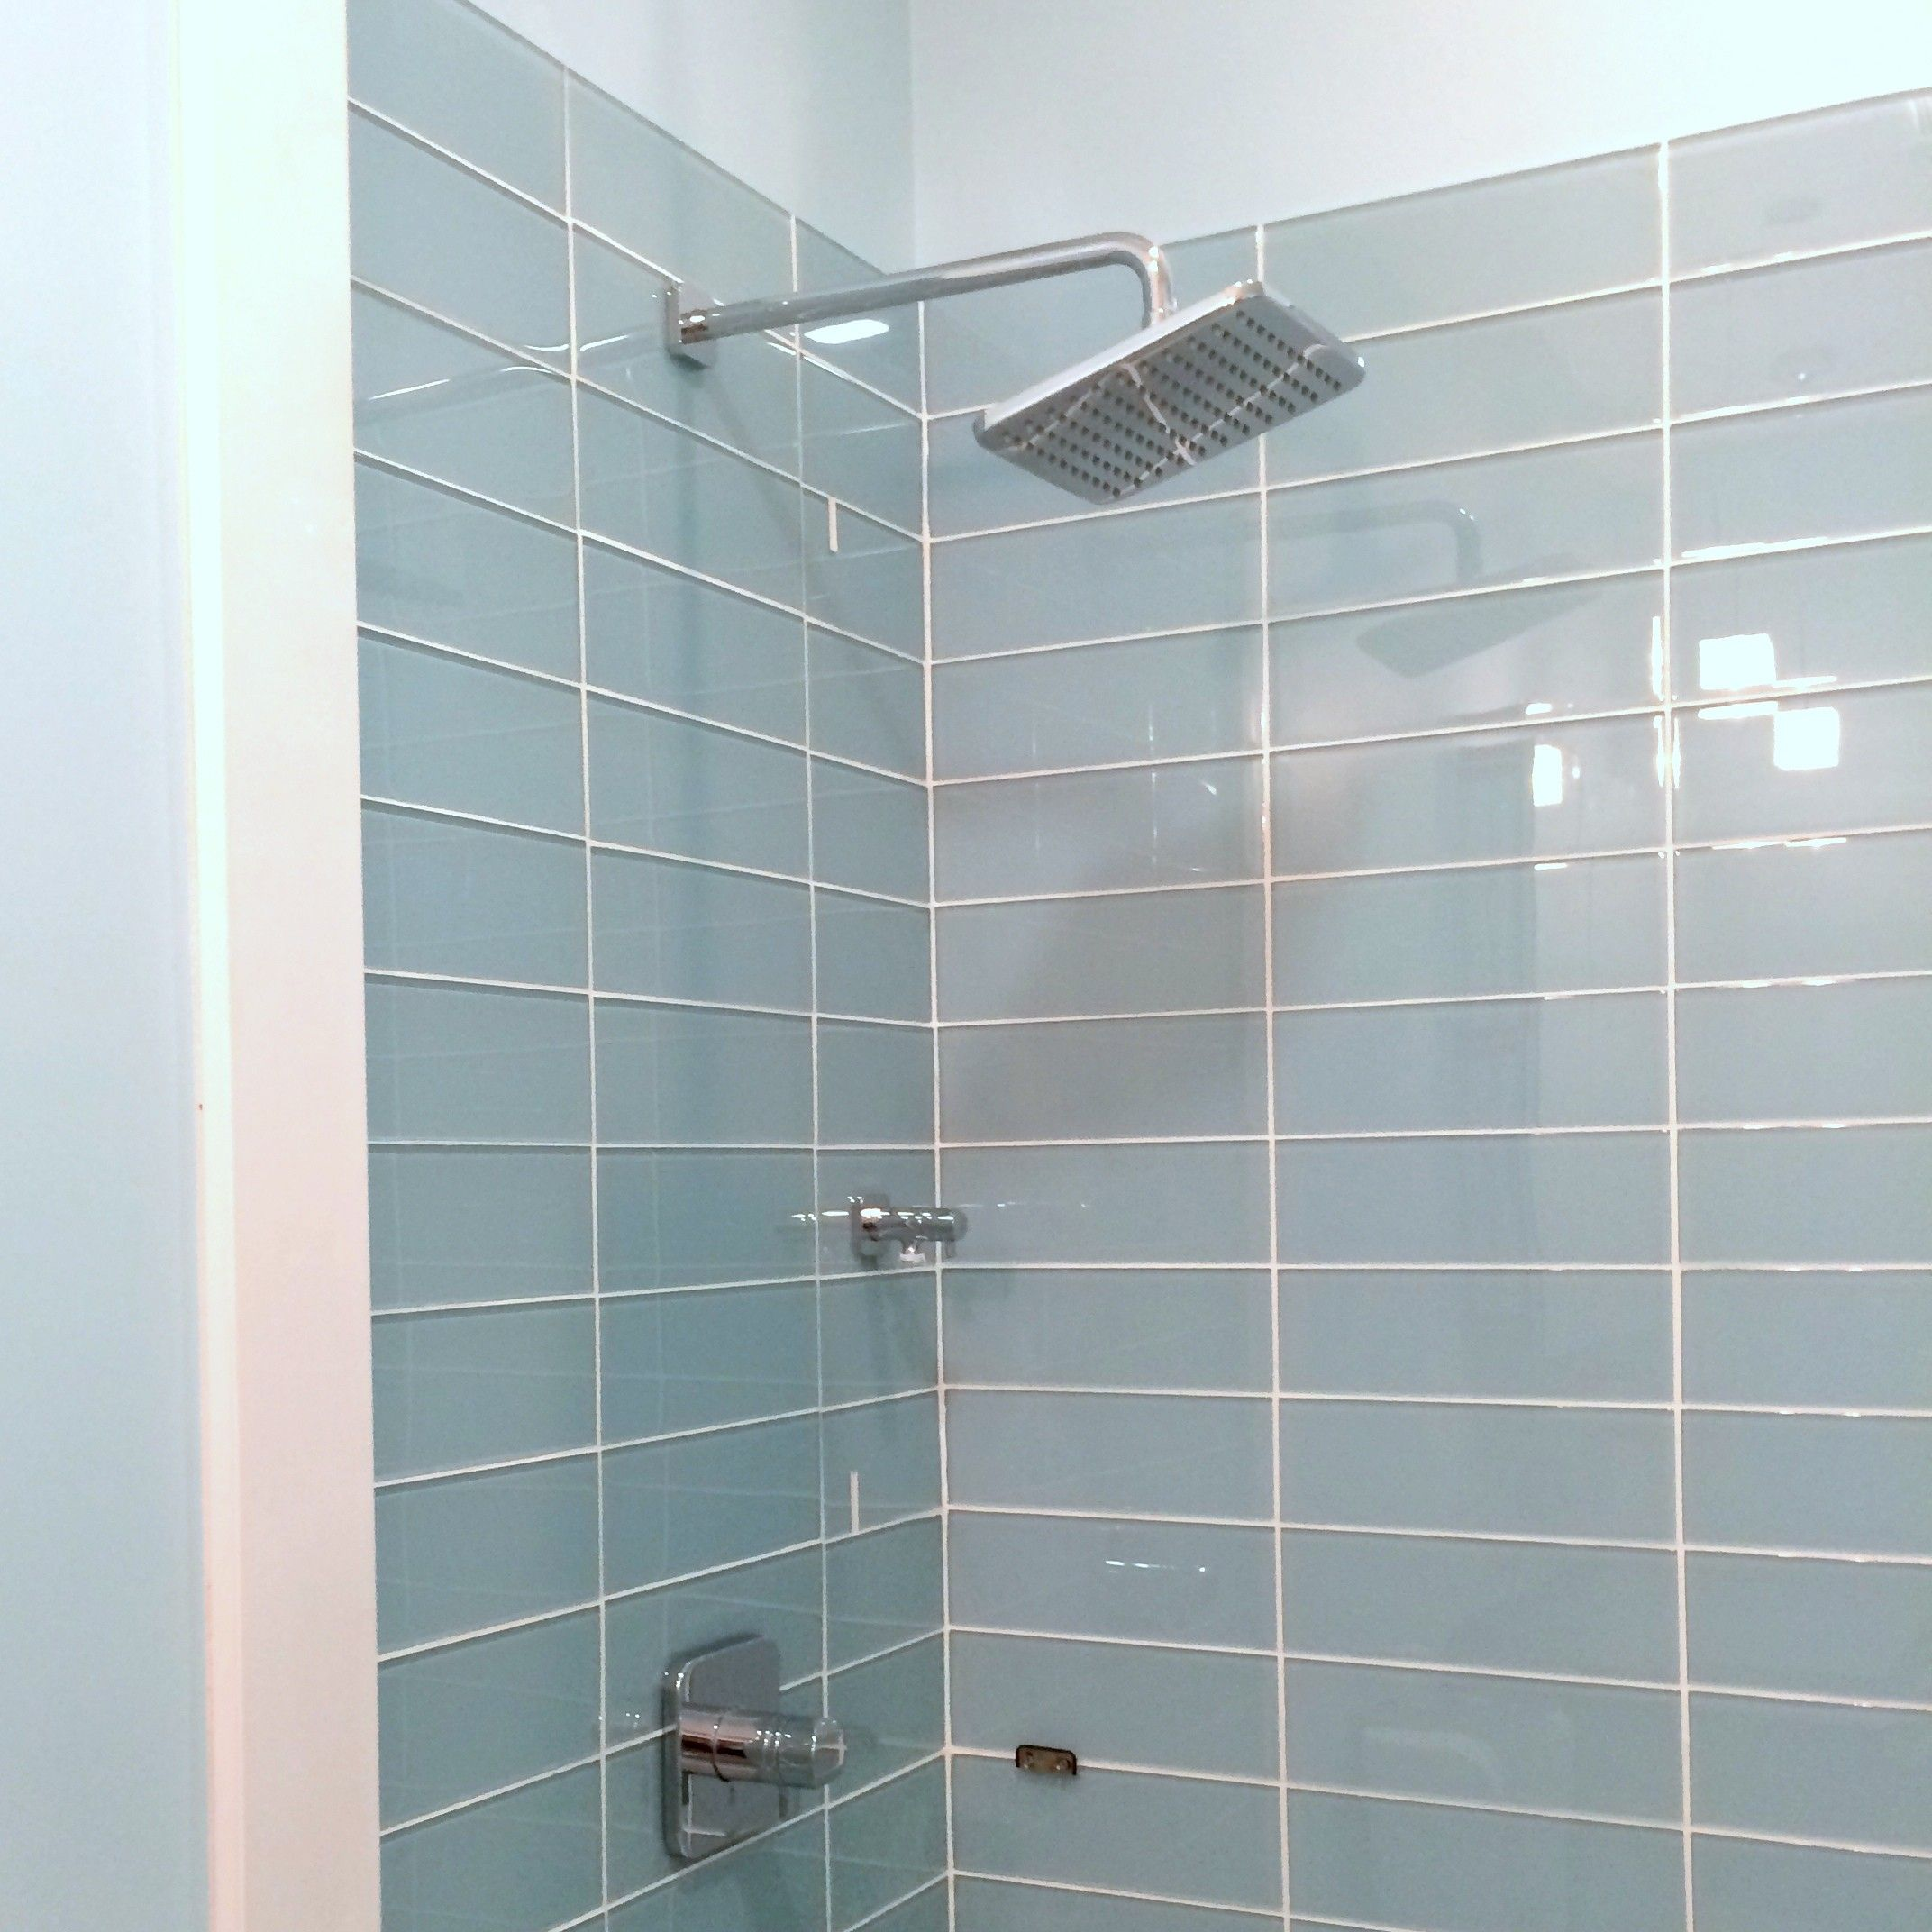 Lush Glass Subway Tile  Vapor 4x12 in 2019  Bathrooms